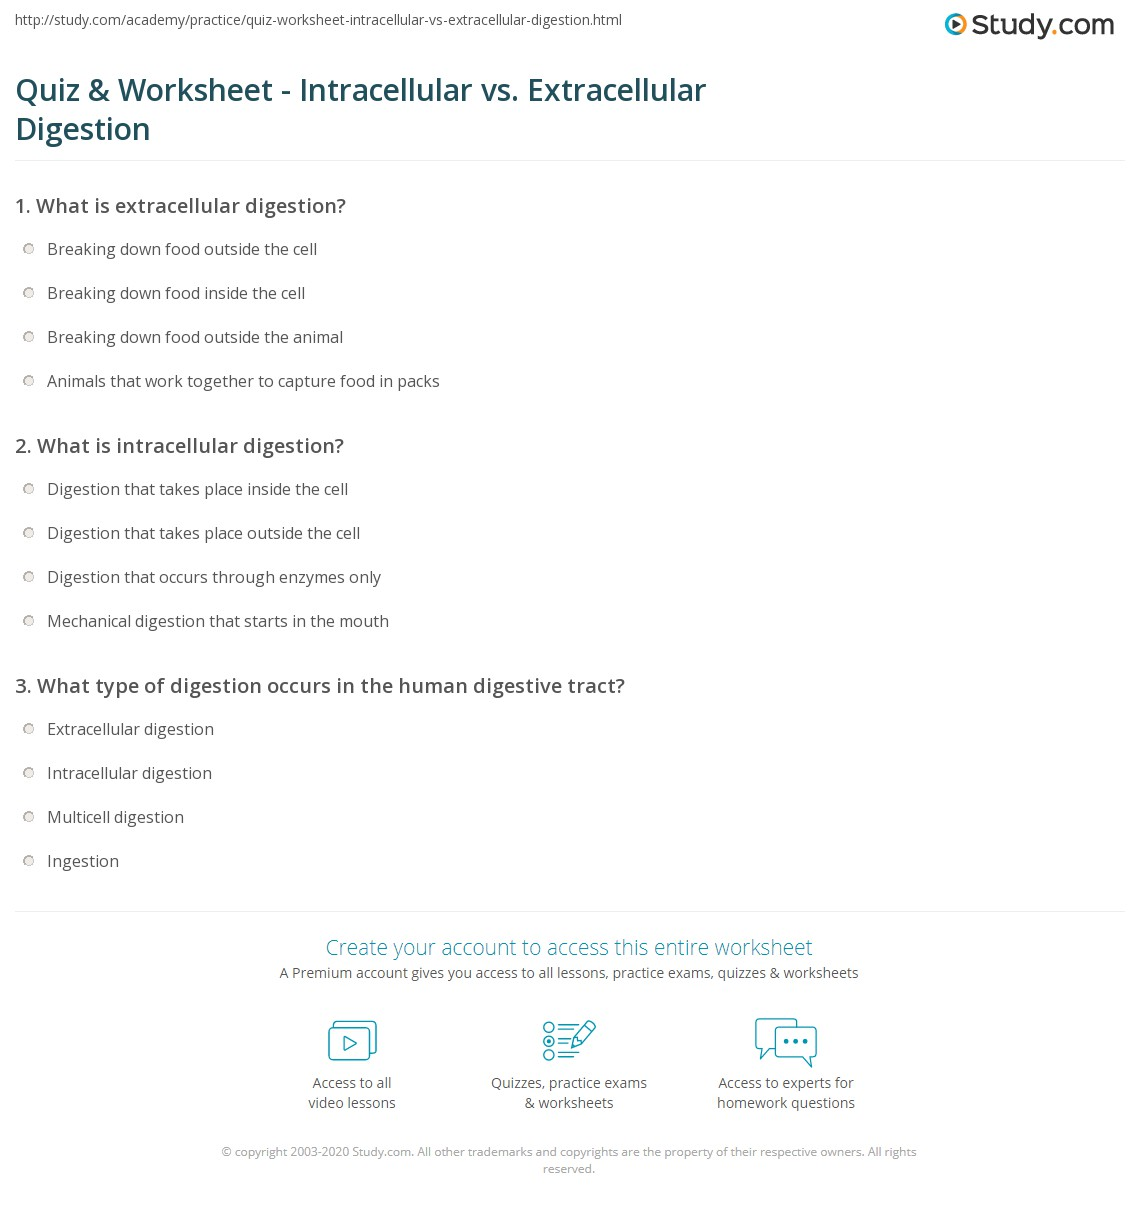 Quiz Amp Worksheet Intracellular Vs Extracellular